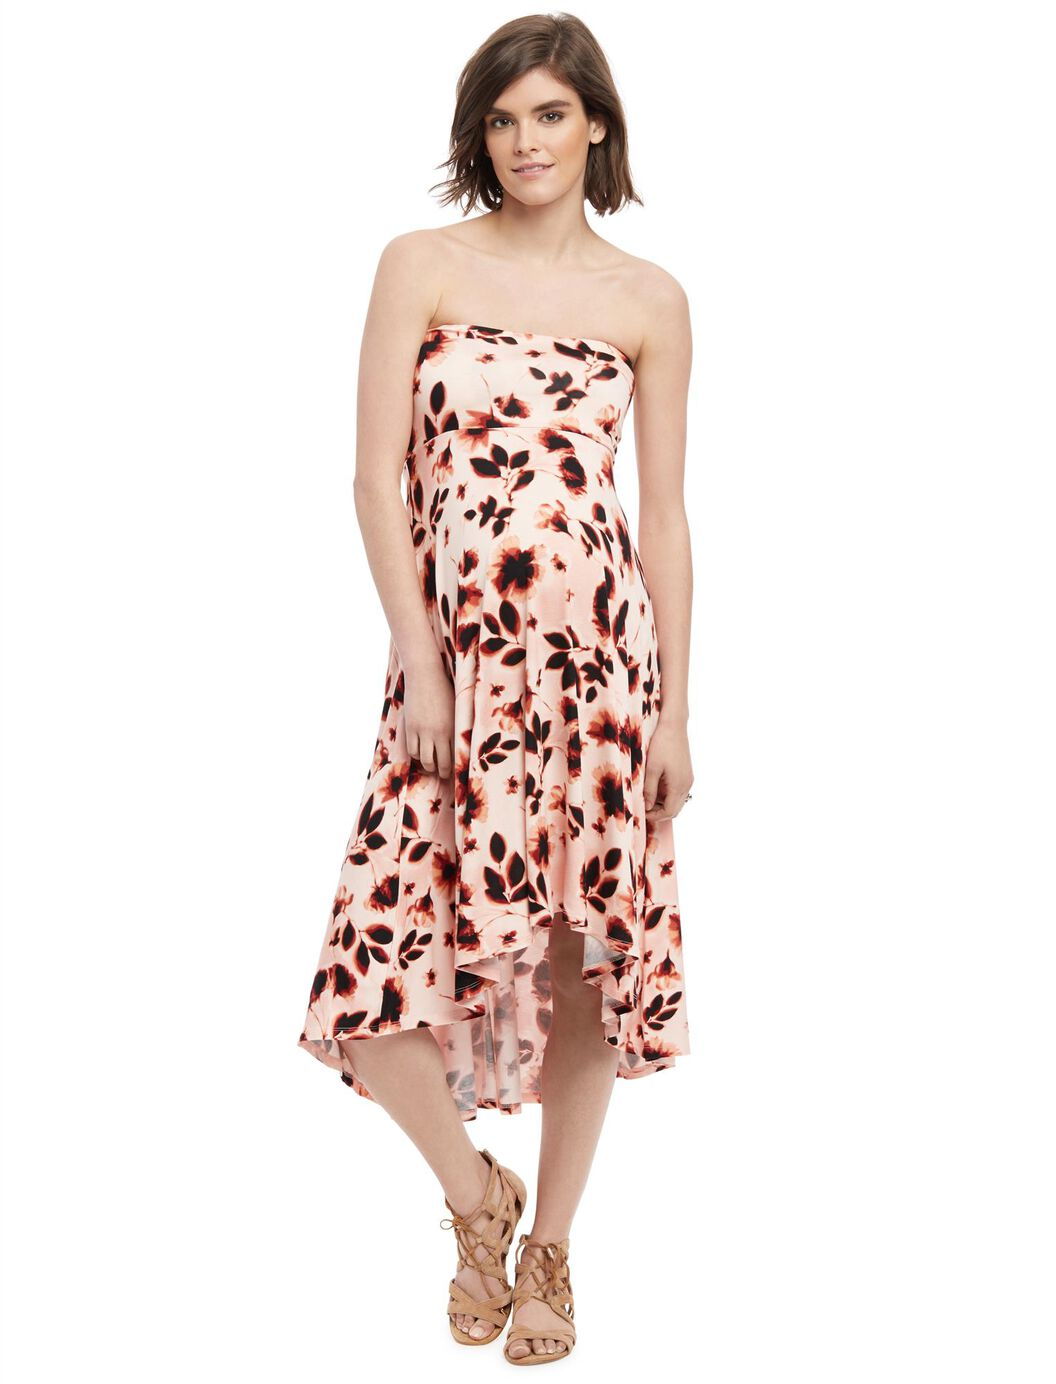 Strapless high low hem maternity dress pink floral destination strapless high low hem maternity dress pink floral pink floral ombrellifo Image collections